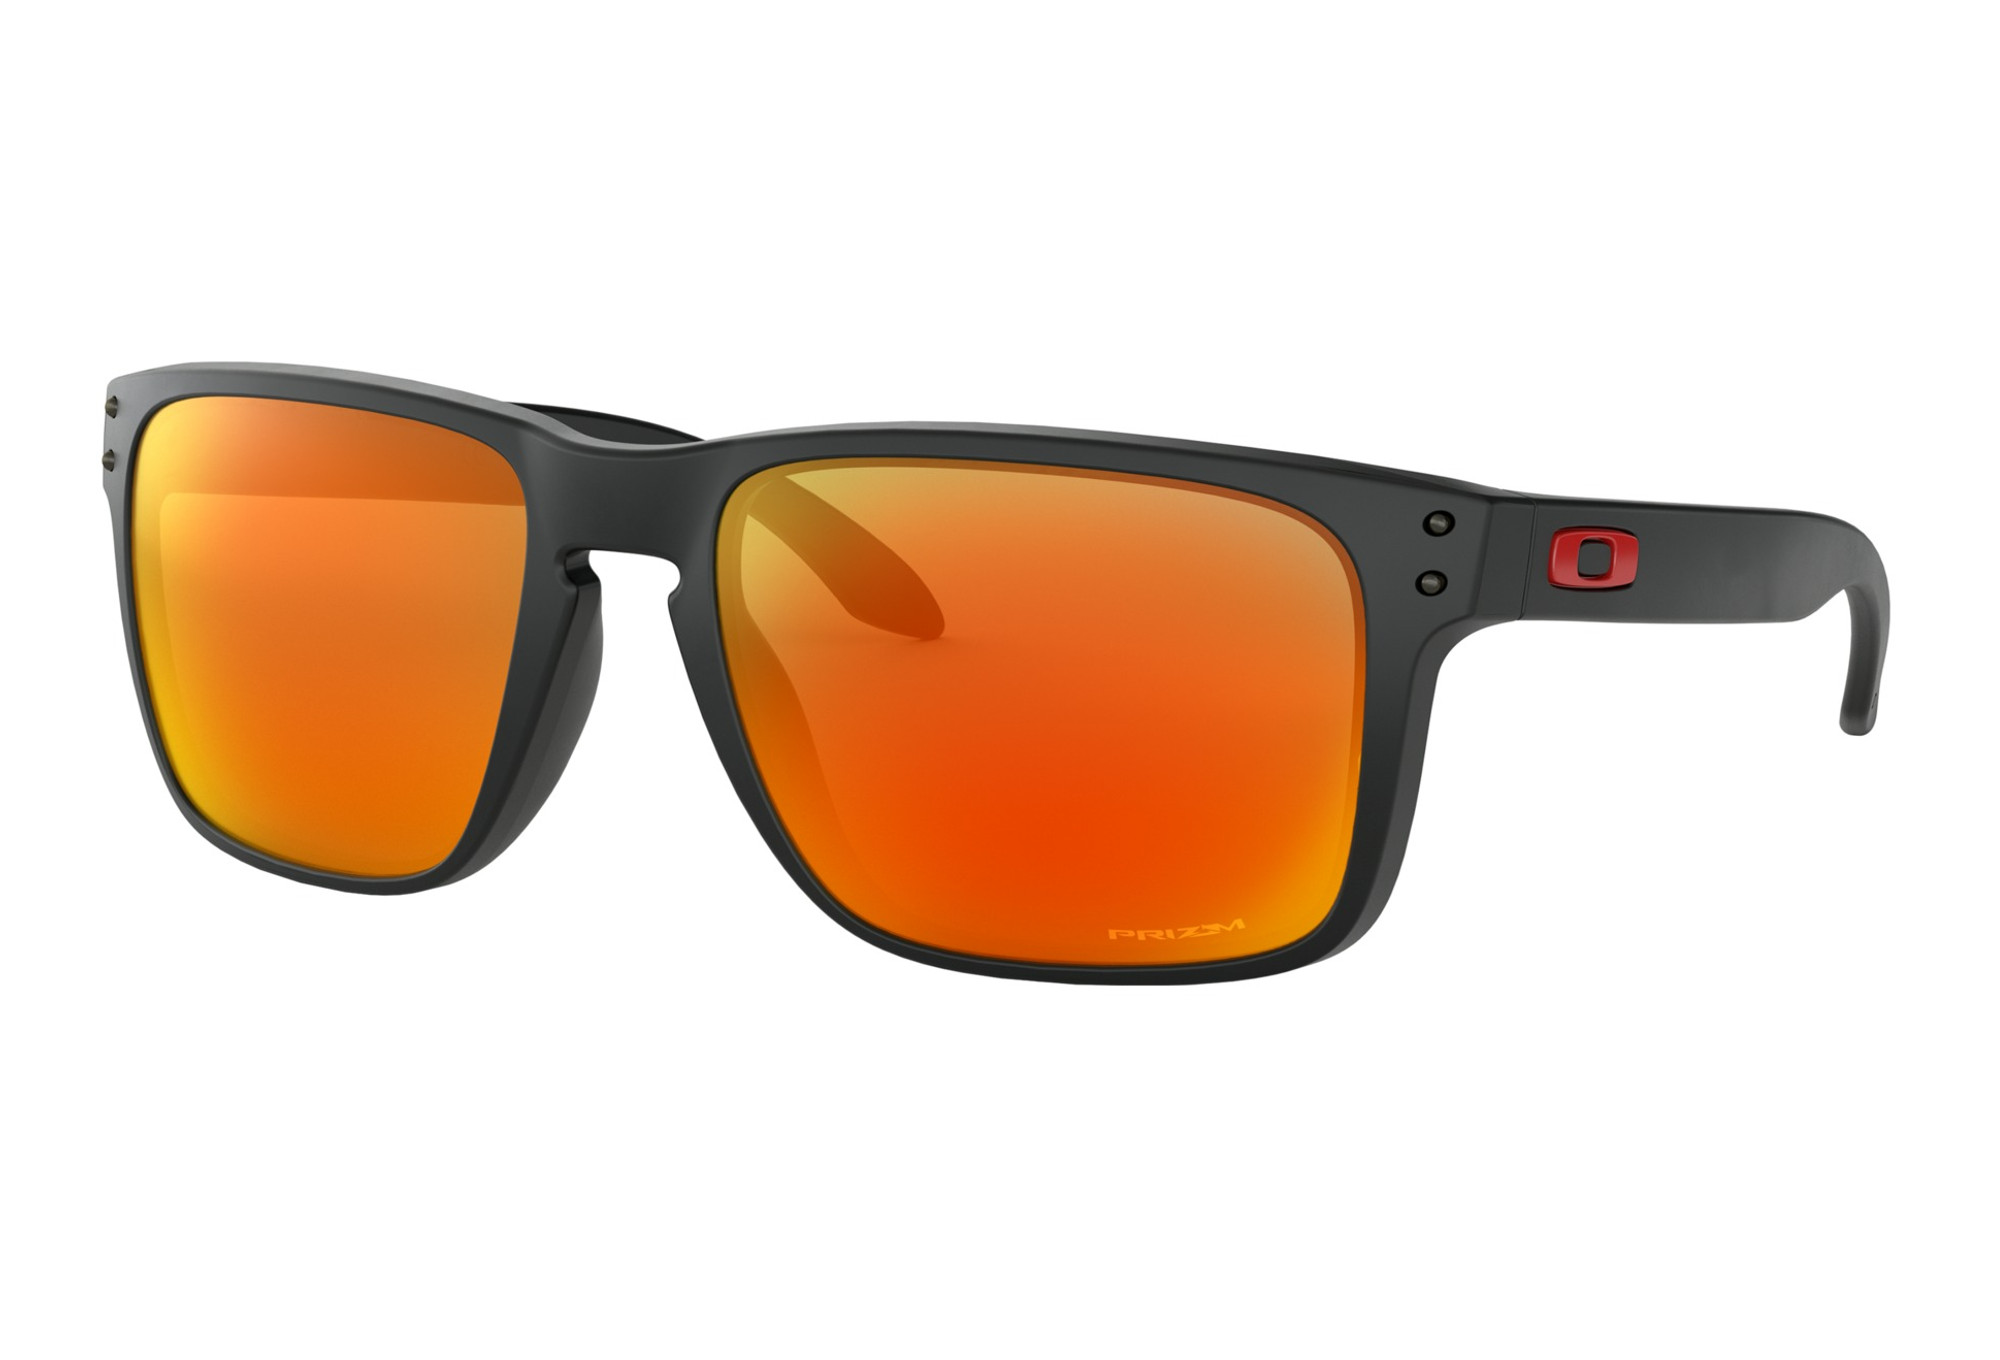 7df00452a2 Oakley Holbrook XL Sunglasses Black - Prizm Ruby OO9417-0459 ...